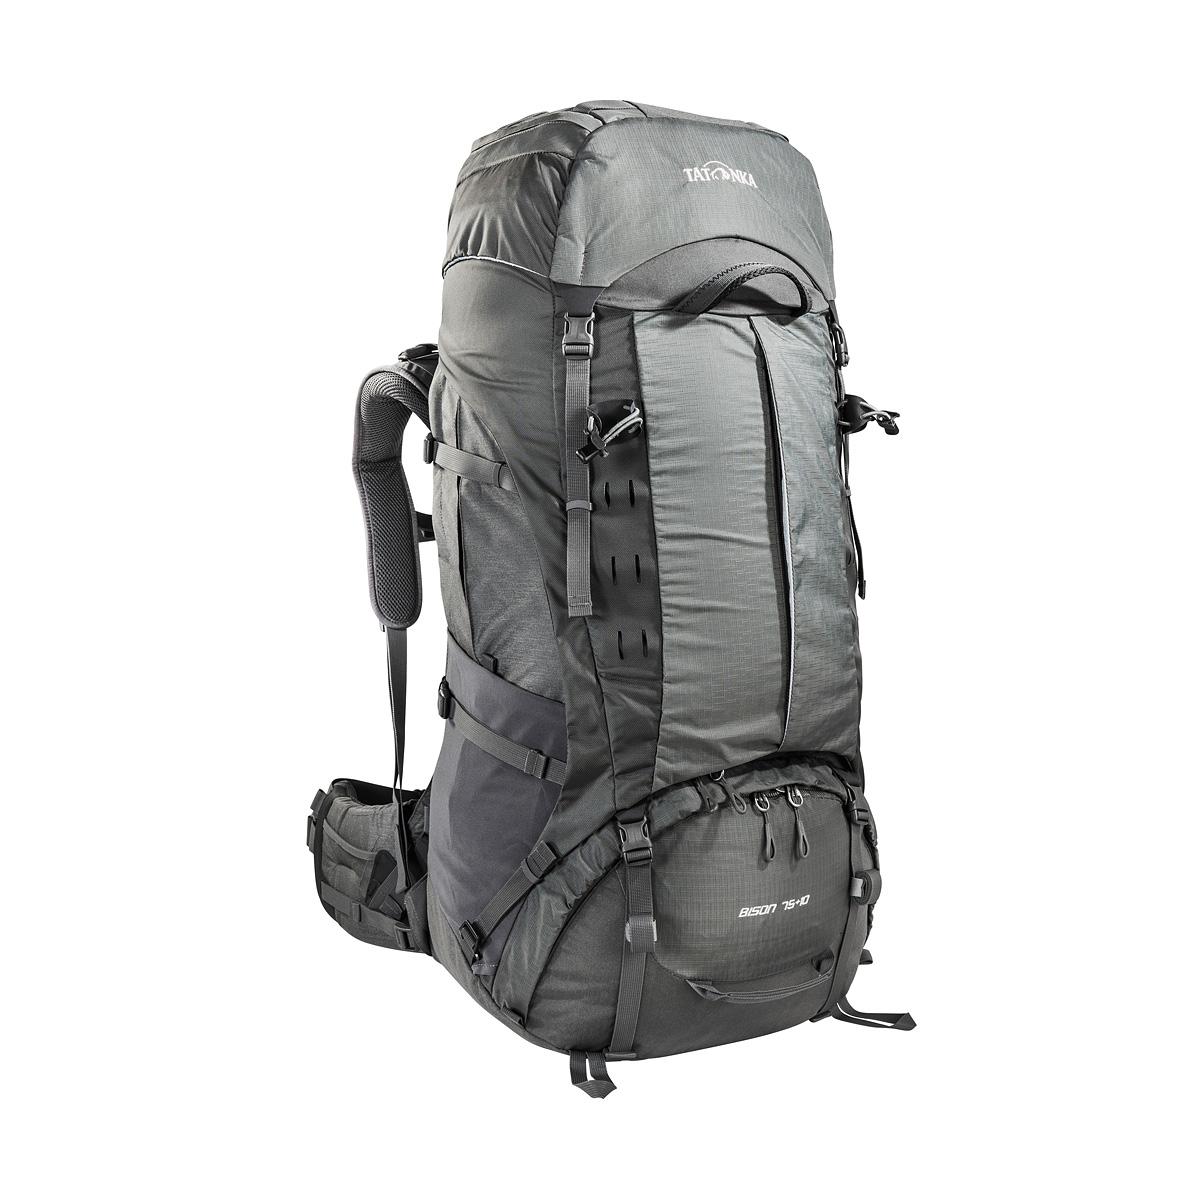 Рюкзак туристический Tatonka Bison 75+10 1358 021